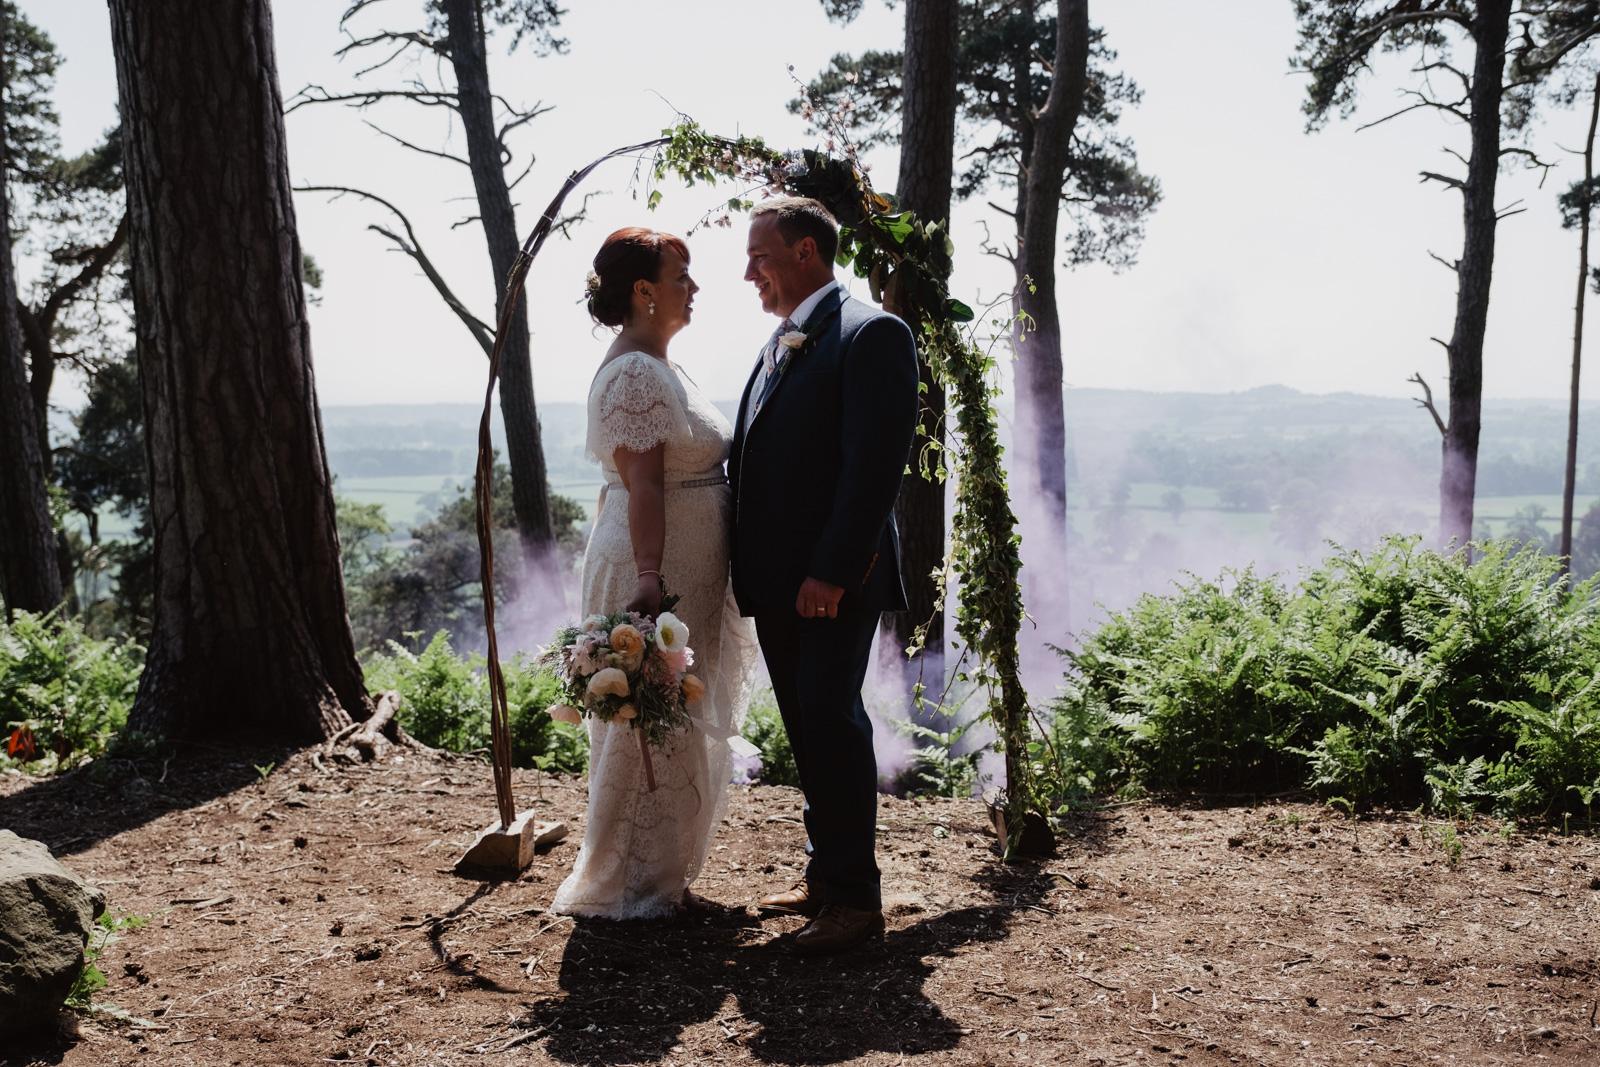 Bridgette-Dahlia-Blush-Silk-Lace-Wedding-Dress-Kate-Beaumont-Sheffield-Ivory-Fayre-12.jpg